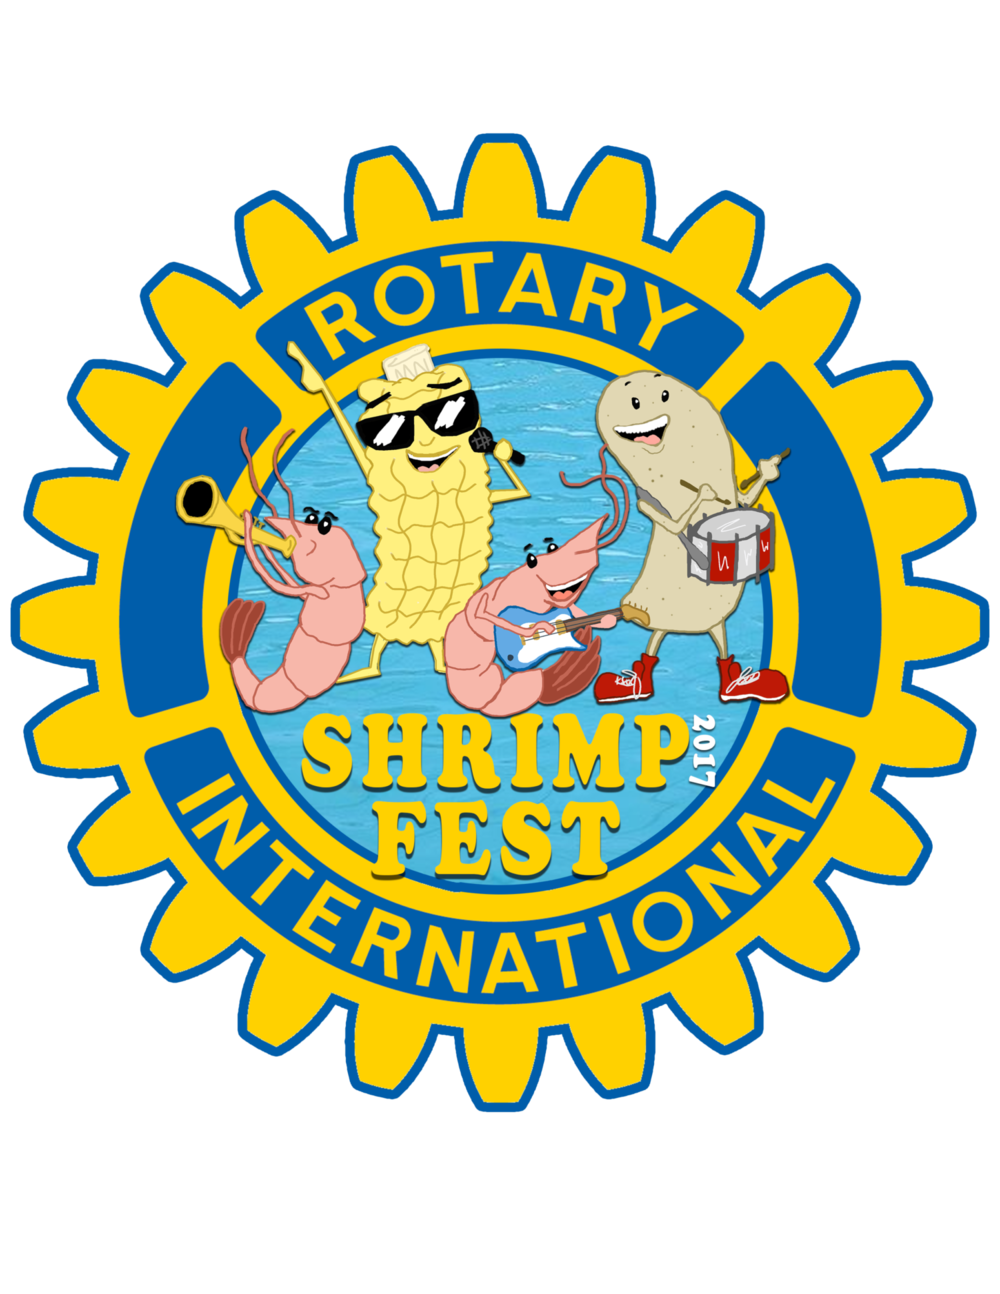 shrimpFest_LOGO_2017_ocean_2-1500x1941.png